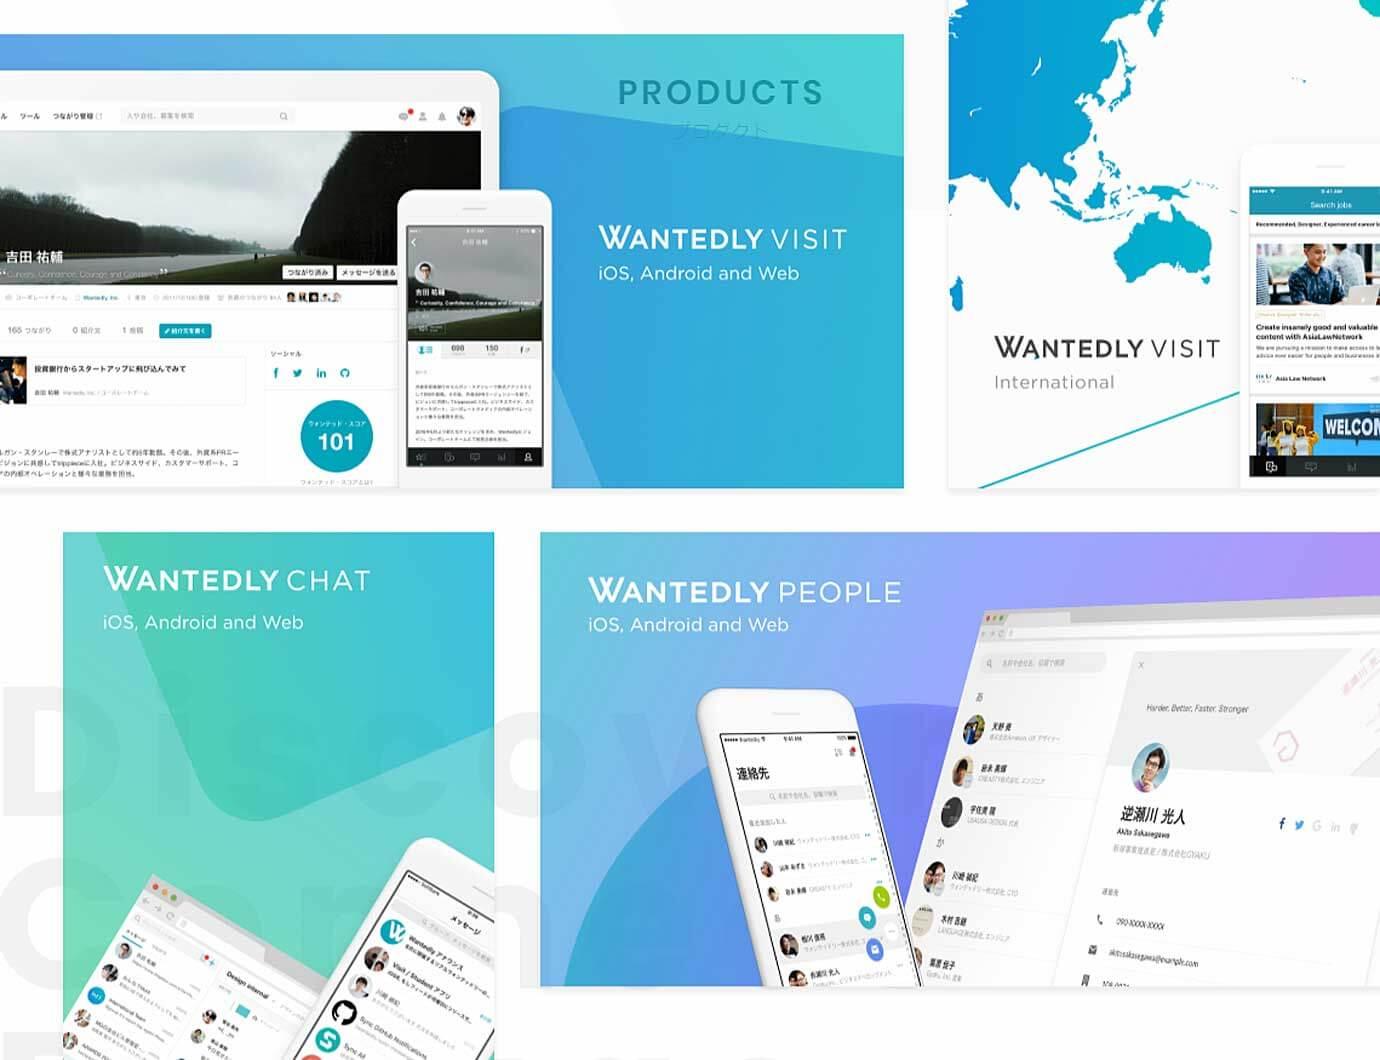 Wantedly VisitやWantedly Peopleのほかに、ビジネスチャットサービス「Wantedly Chat」や業務効率化ツール口コミサイト「Wantedly Tools」なども提供しています。